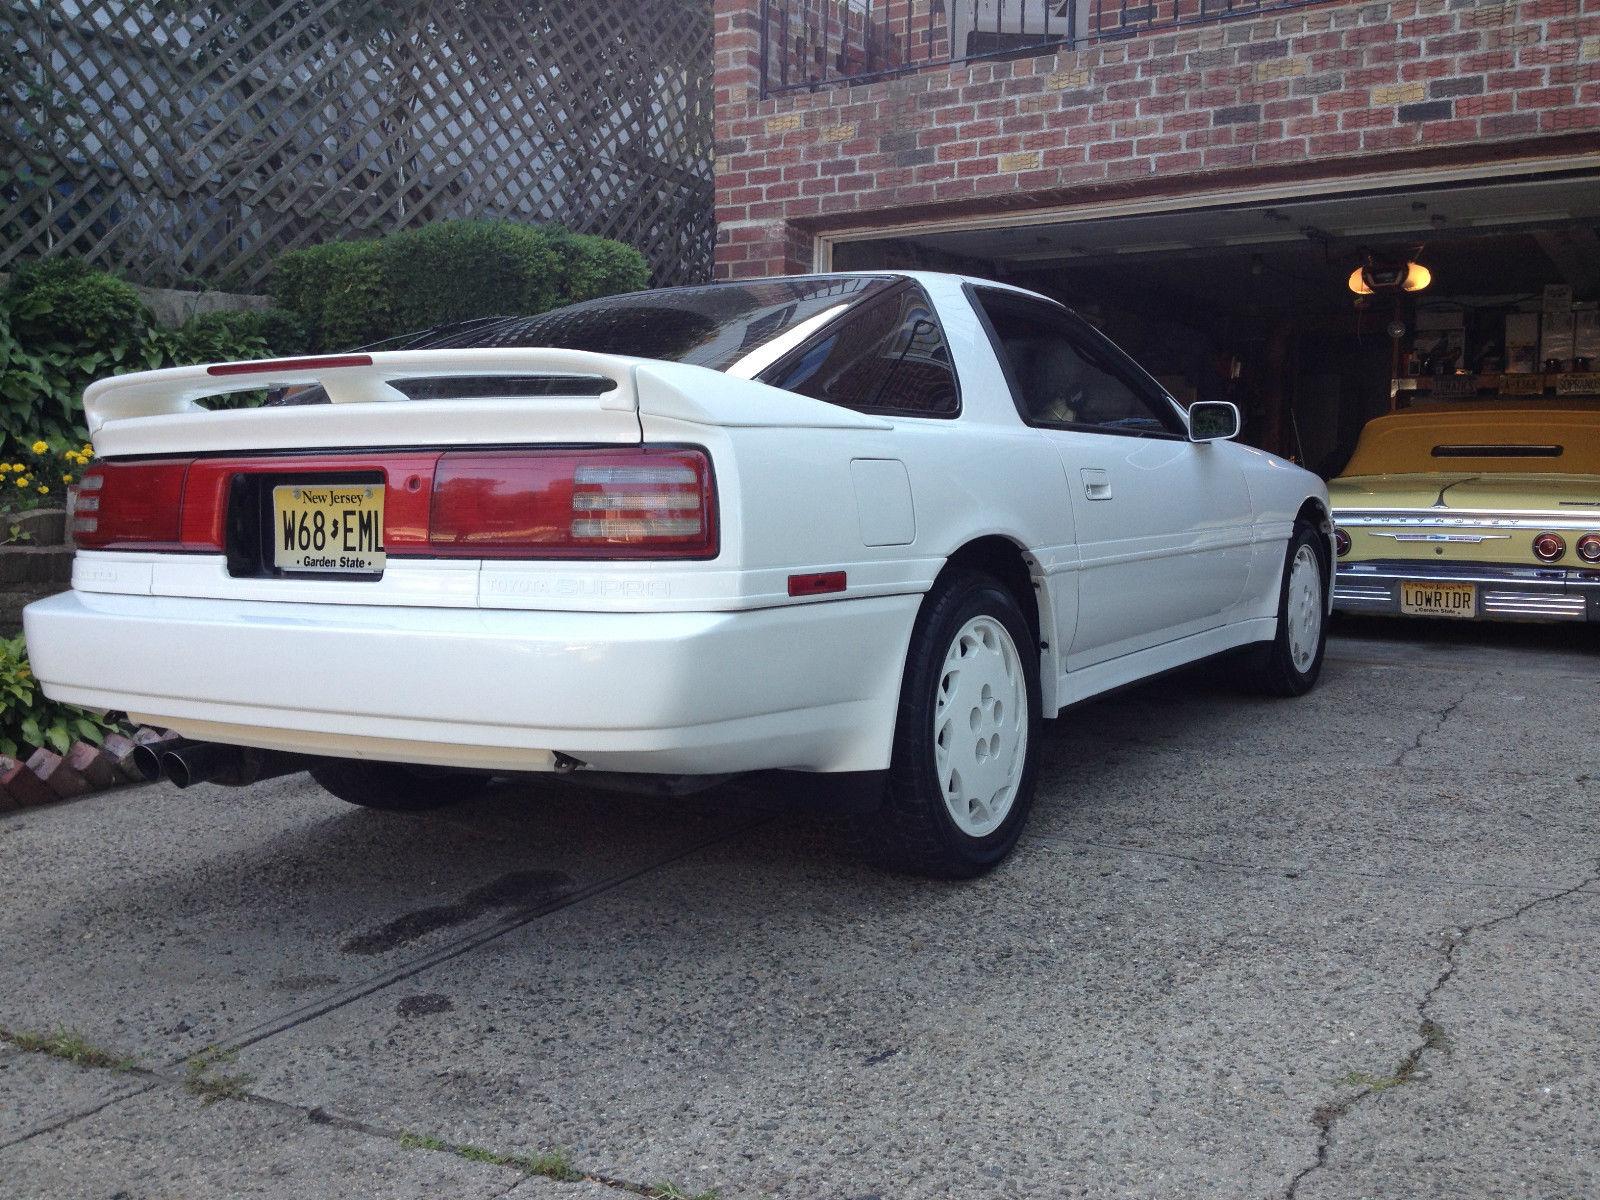 1989 toyota supra turbo hatchback 2 door 3 0l classic toyota supra 1989 for sale. Black Bedroom Furniture Sets. Home Design Ideas